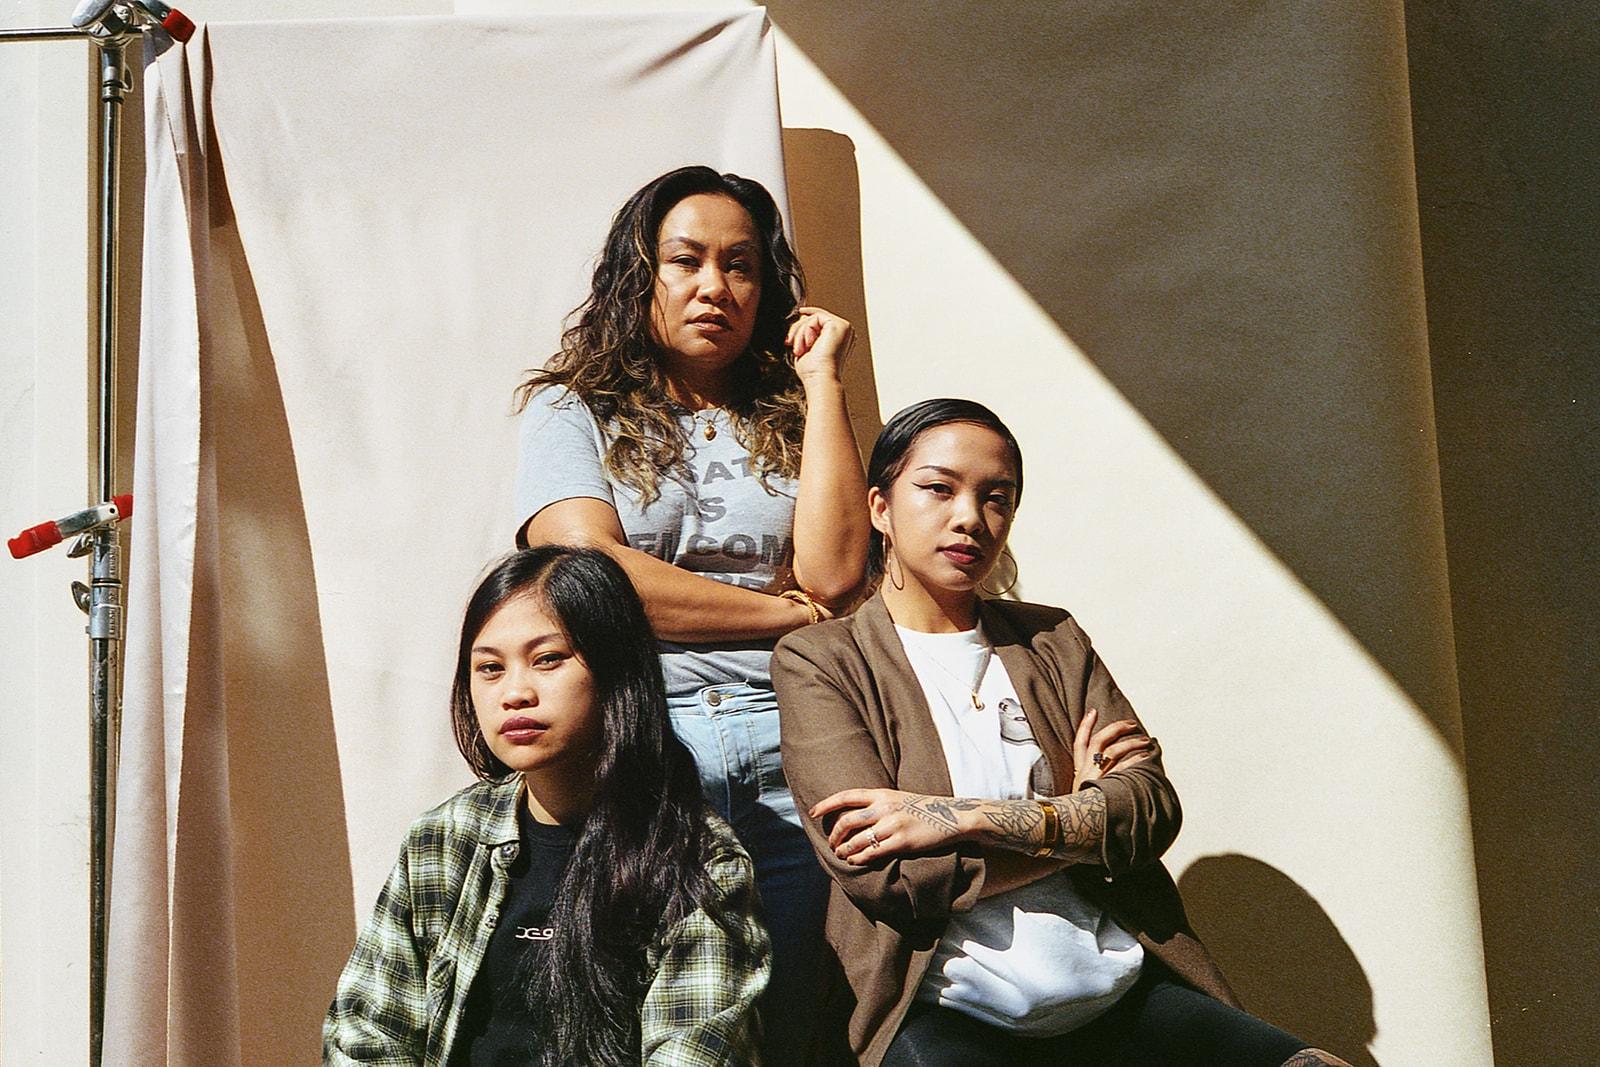 ruby ibarra klassy rocky rivera faith santilla filipino american music artists us song track collaboration circa19 immigrants culture rapper hip hop spoken word poet